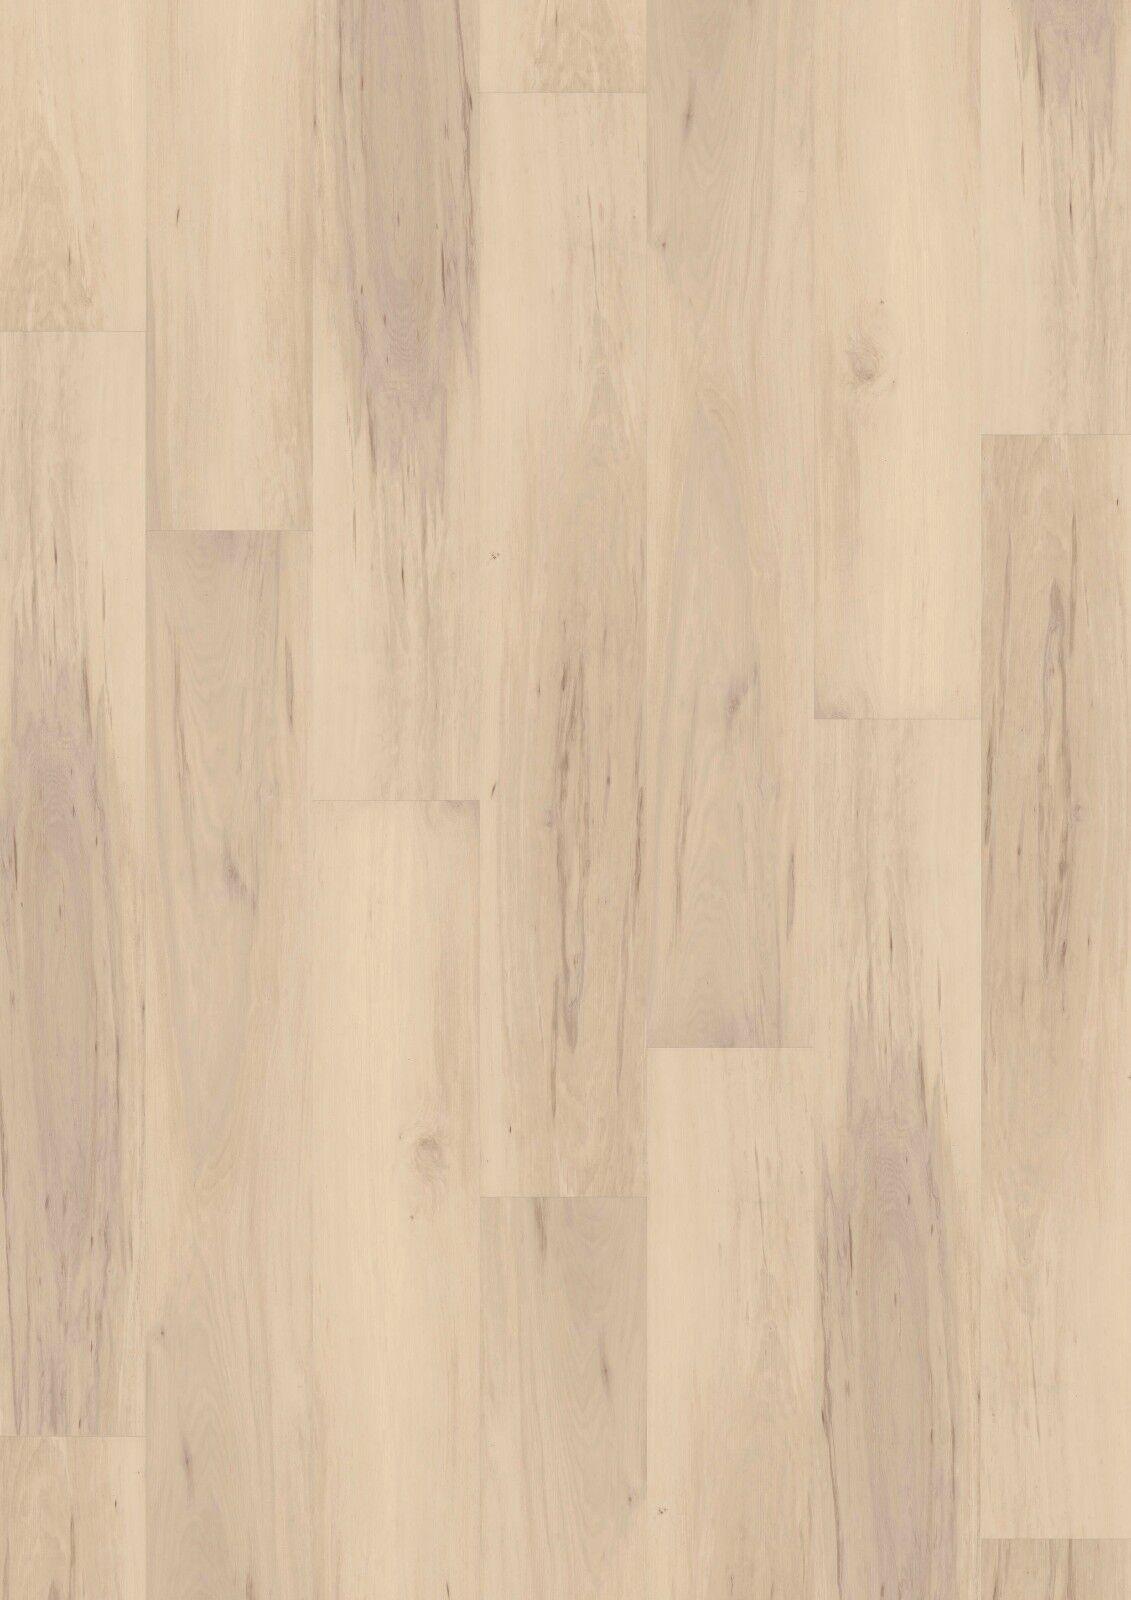 JOKA / INKU Design 2851 Vinylboden / Designboden (Milky Maple)